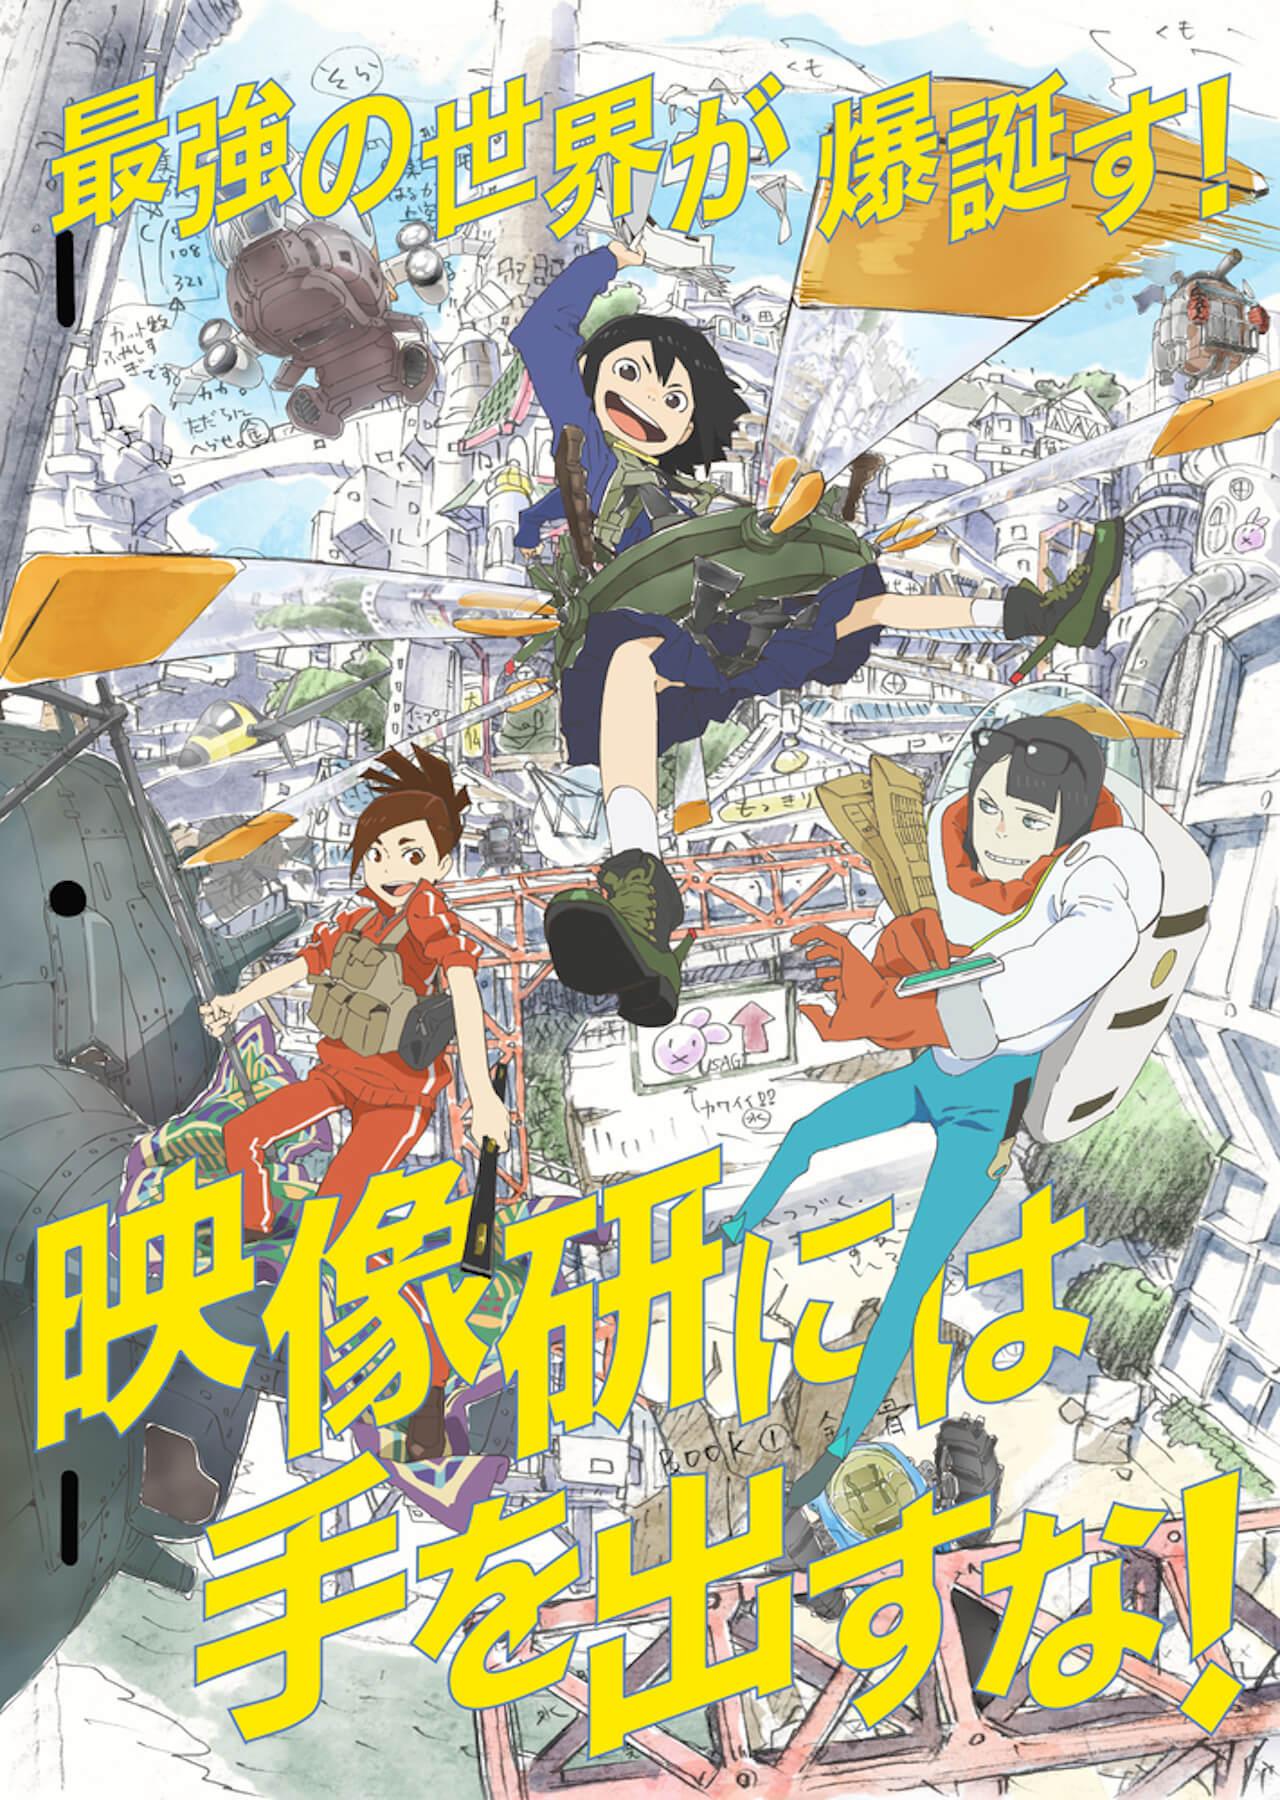 chelmico、アニメ『映像研には手を出すな!』のOPに抜擢された「Easy Breezy 」のジャケ写を解禁|アニメのPVにて先駆け音源も公開中! music191212-chelmico-eizouken-anime-3